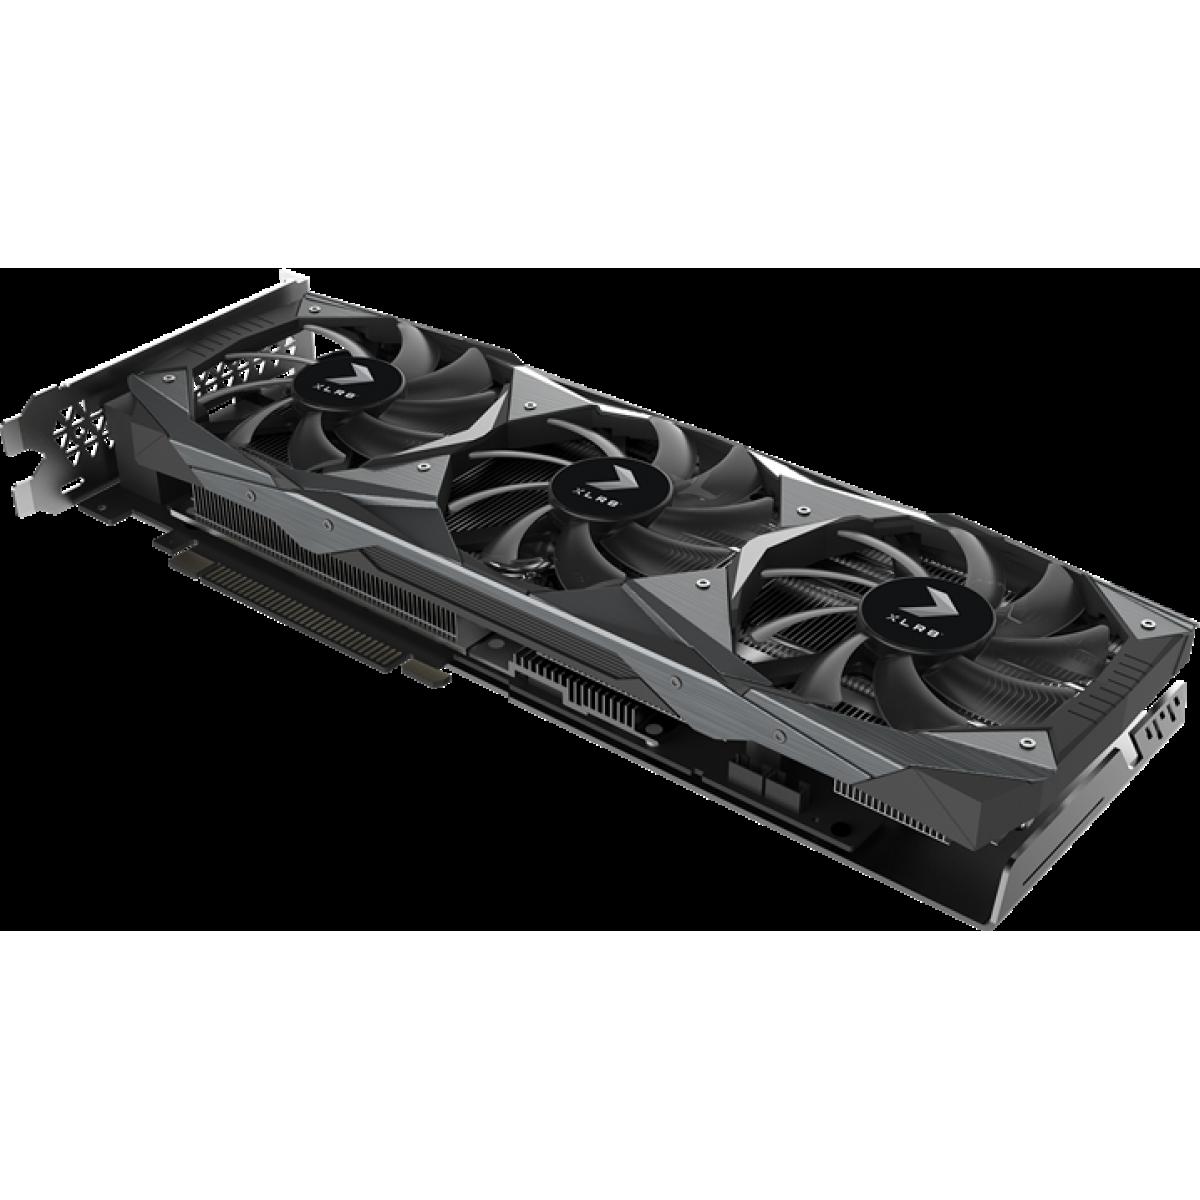 Placa de Vídeo PNY Geforce RTX 2080 Ti XRL8 Gaming Overclocked Edition, 11GB GDDR6